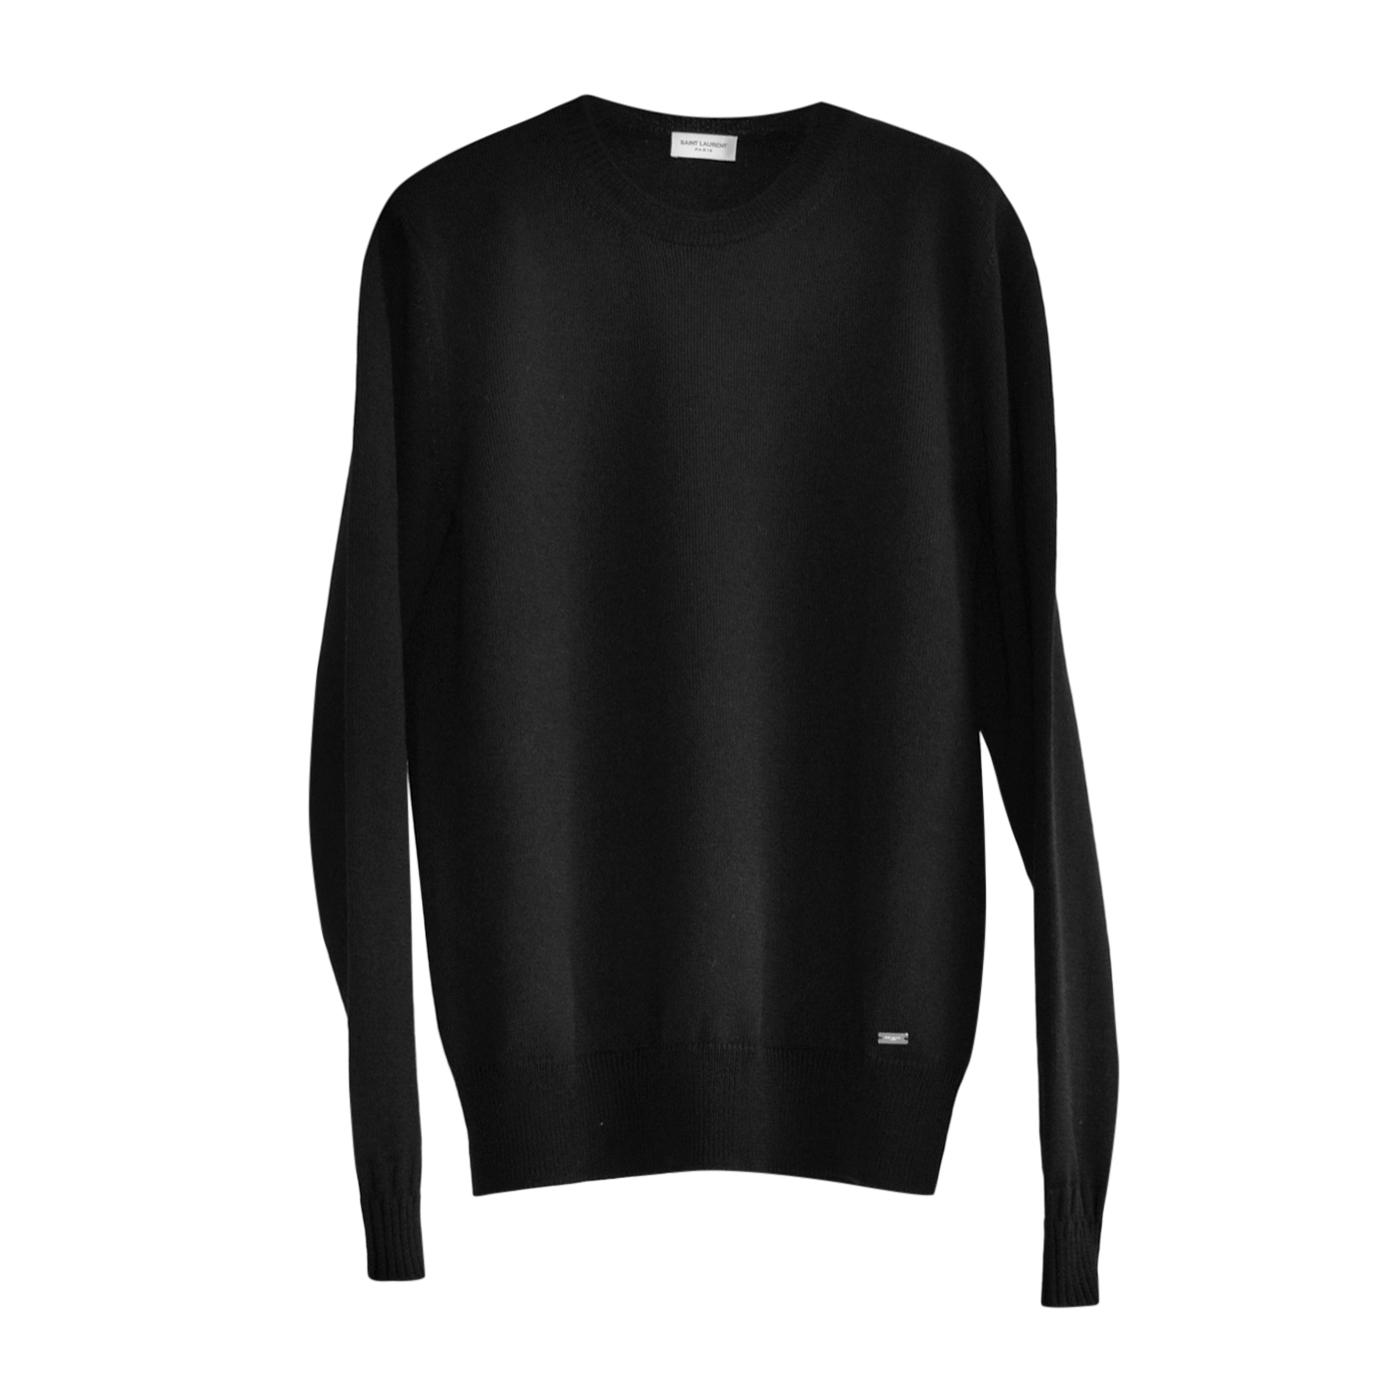 Saint Laurent Black Wool Crew Neck Jumper